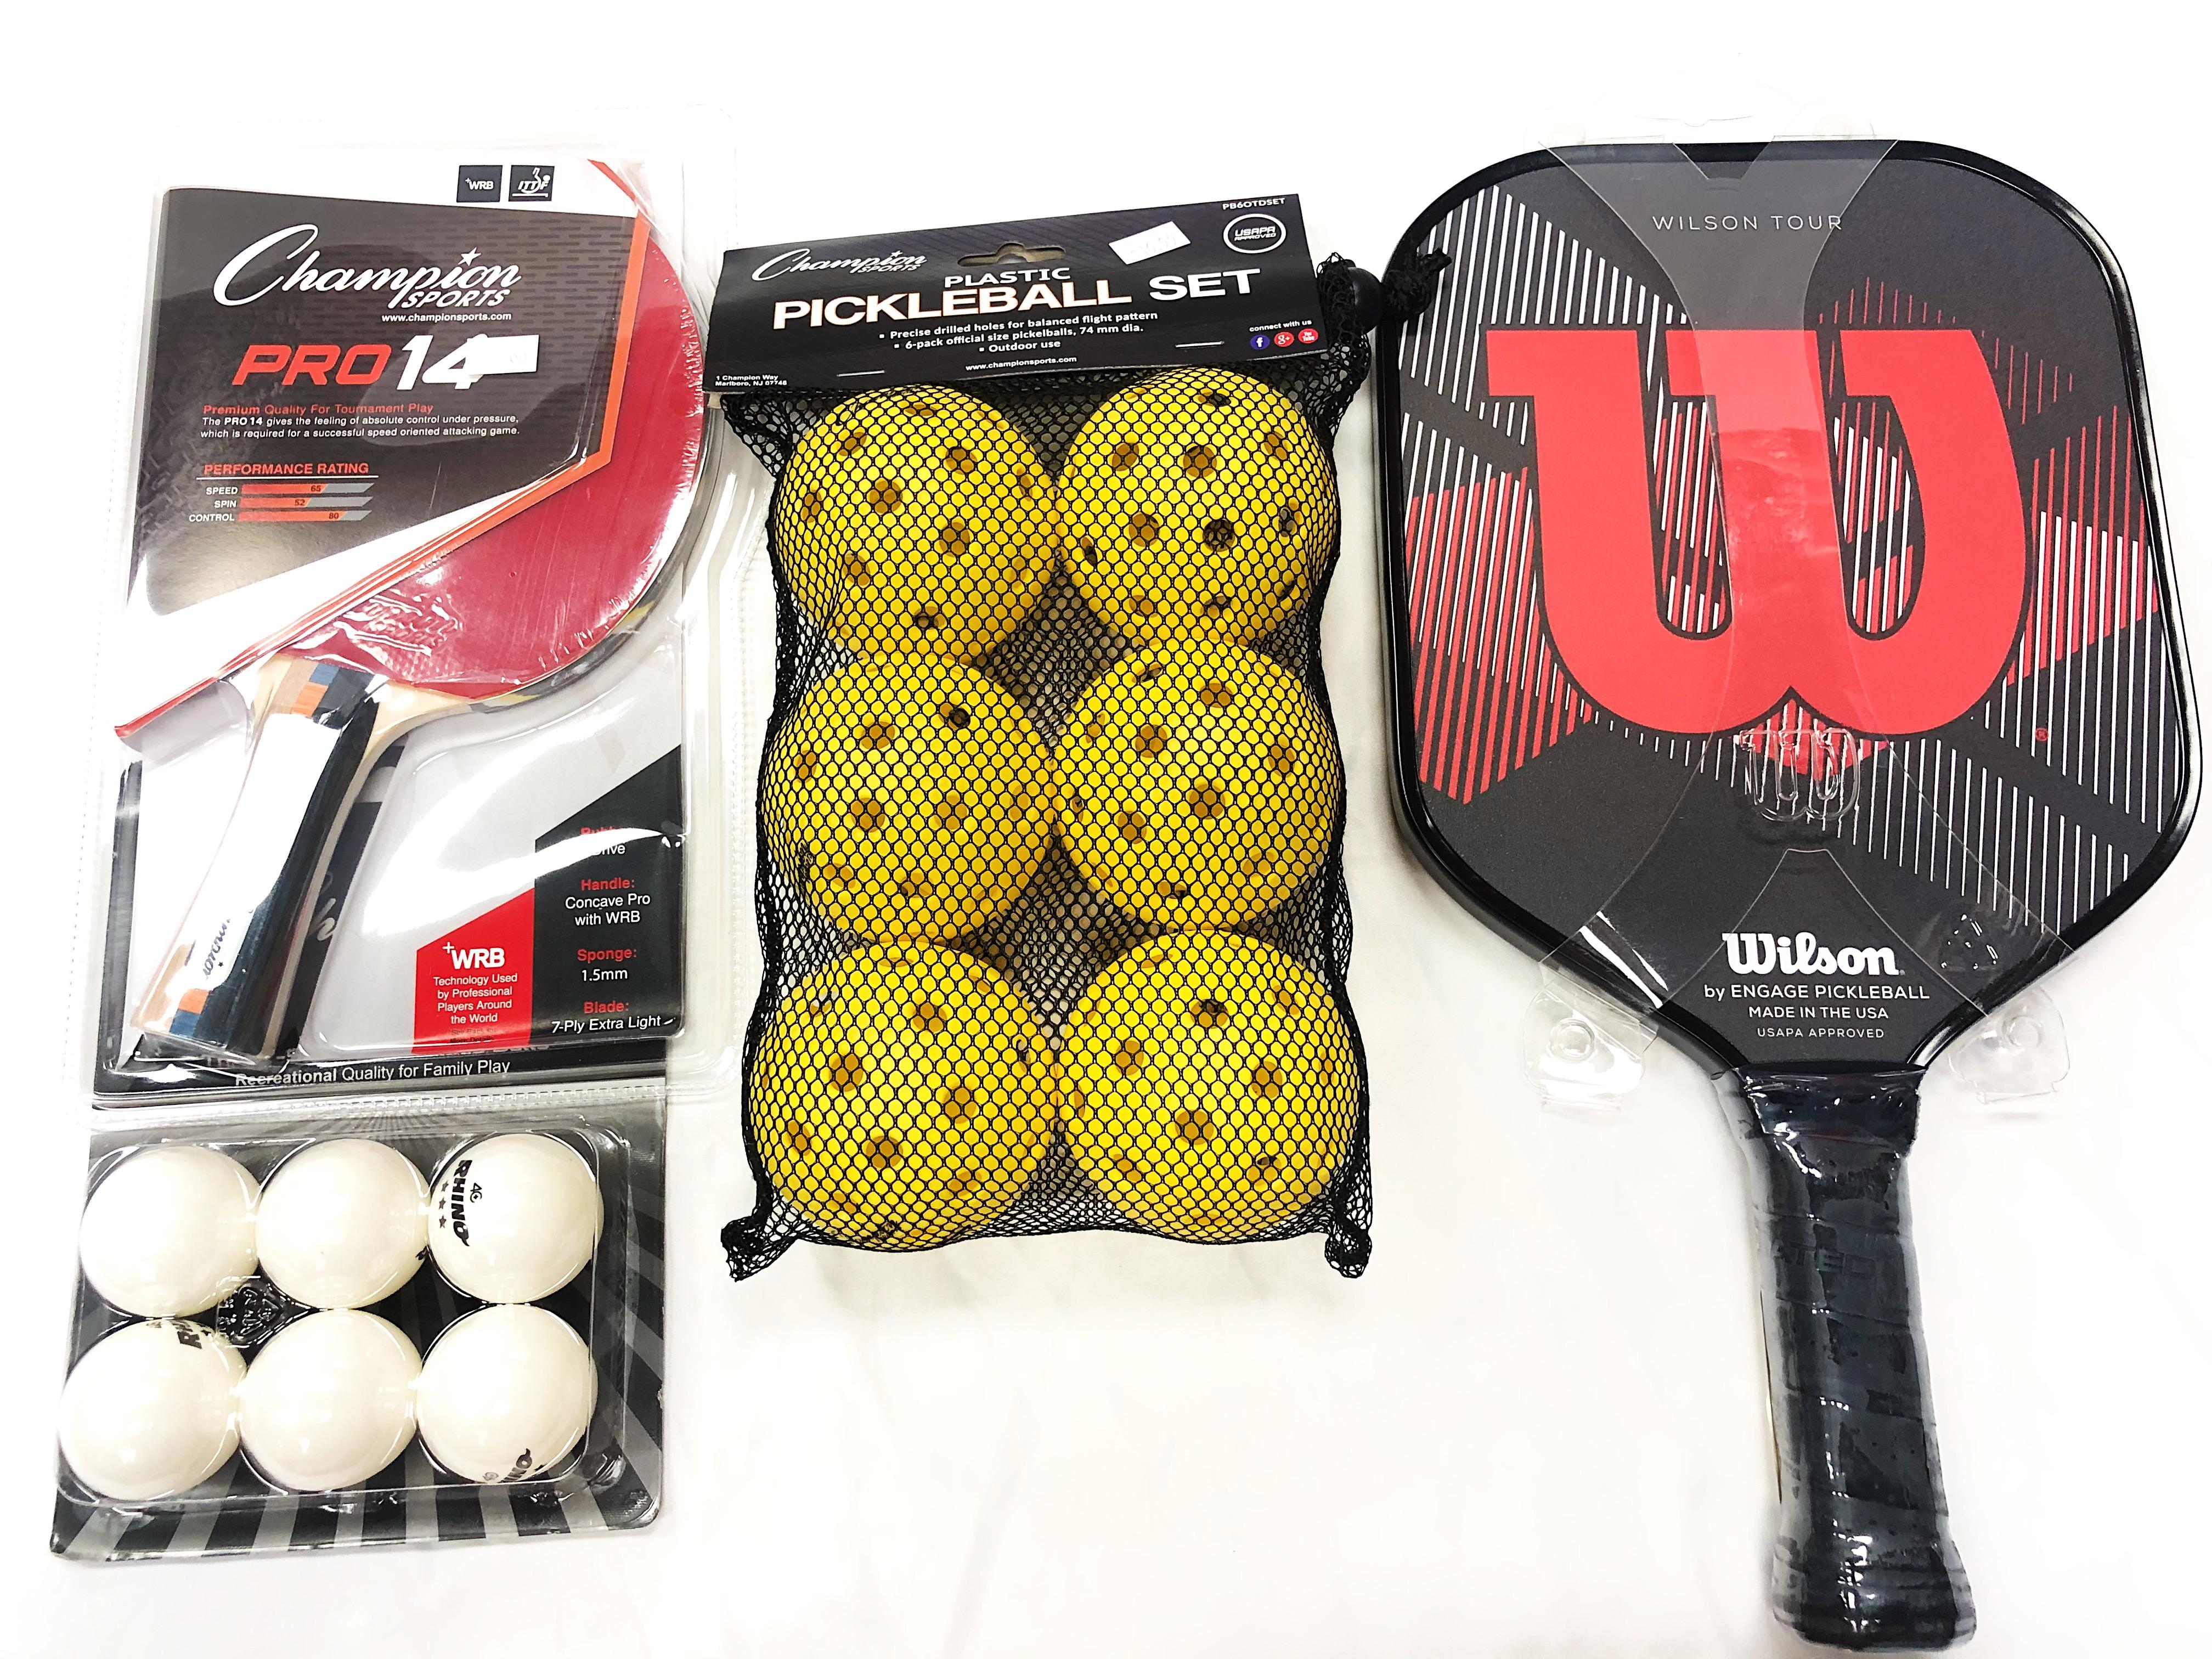 Ping Pong & Pickleball Set